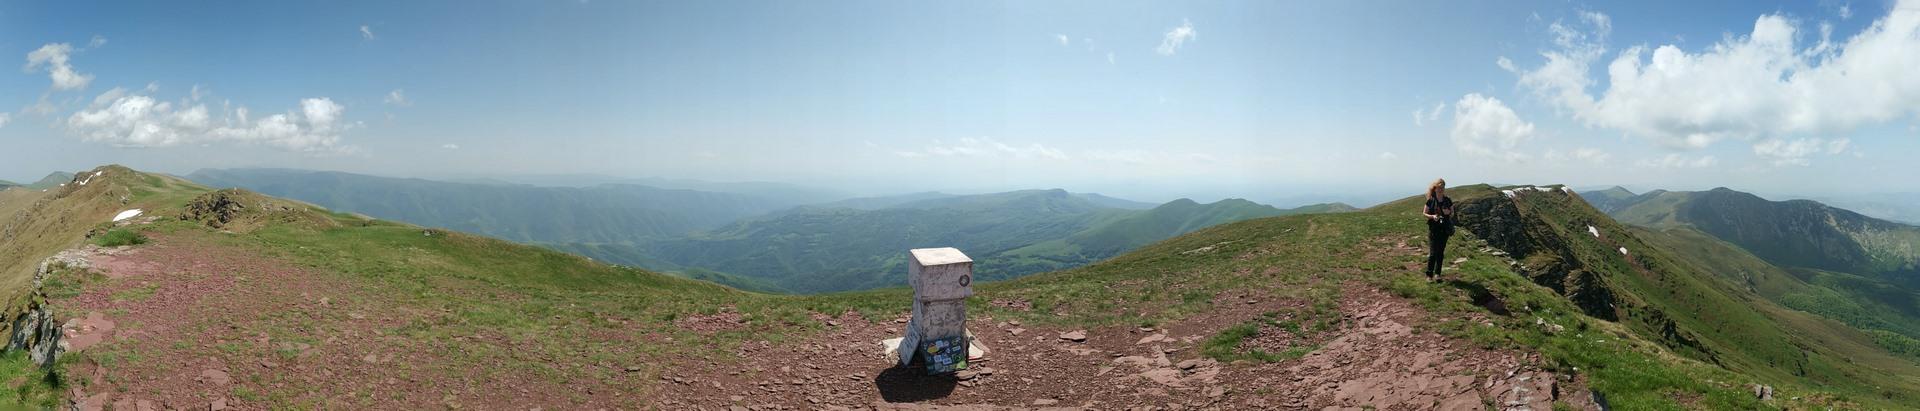 Midzor 2170 m npm